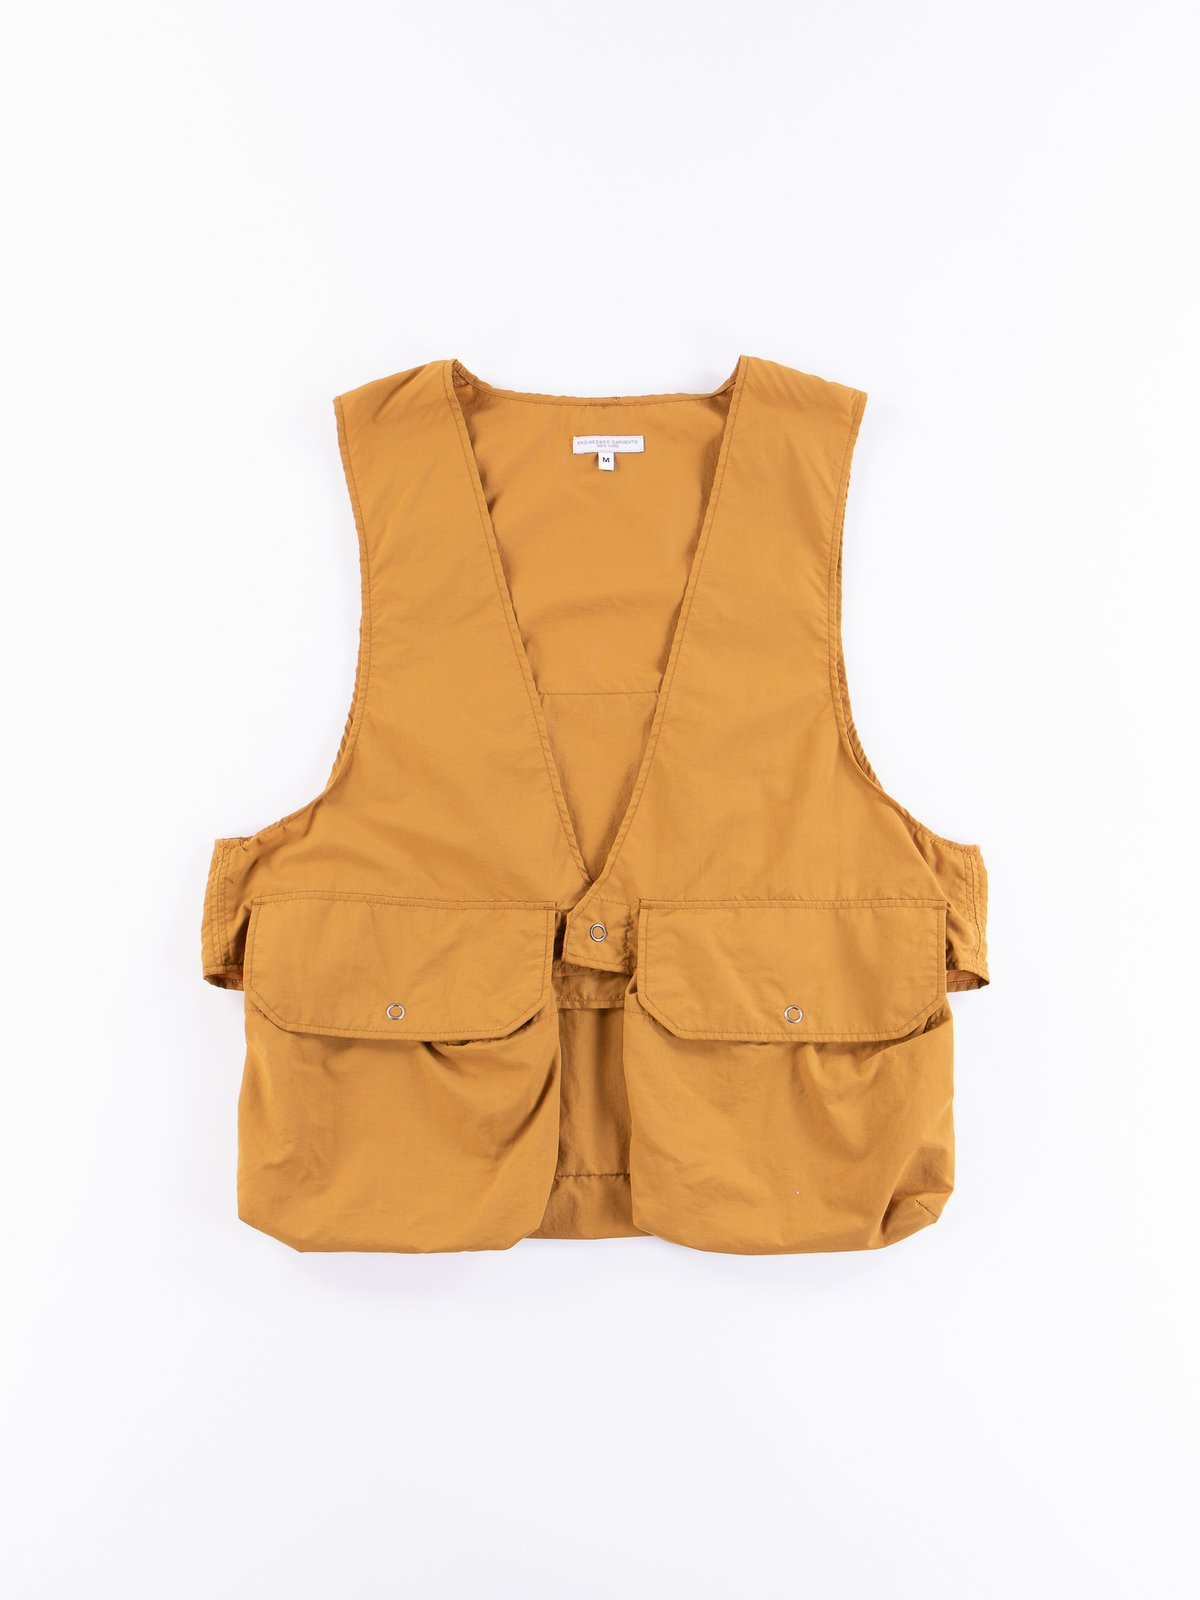 Mustard Acrylic Coated Nylon Taffetta Fowl Vest - Image 1